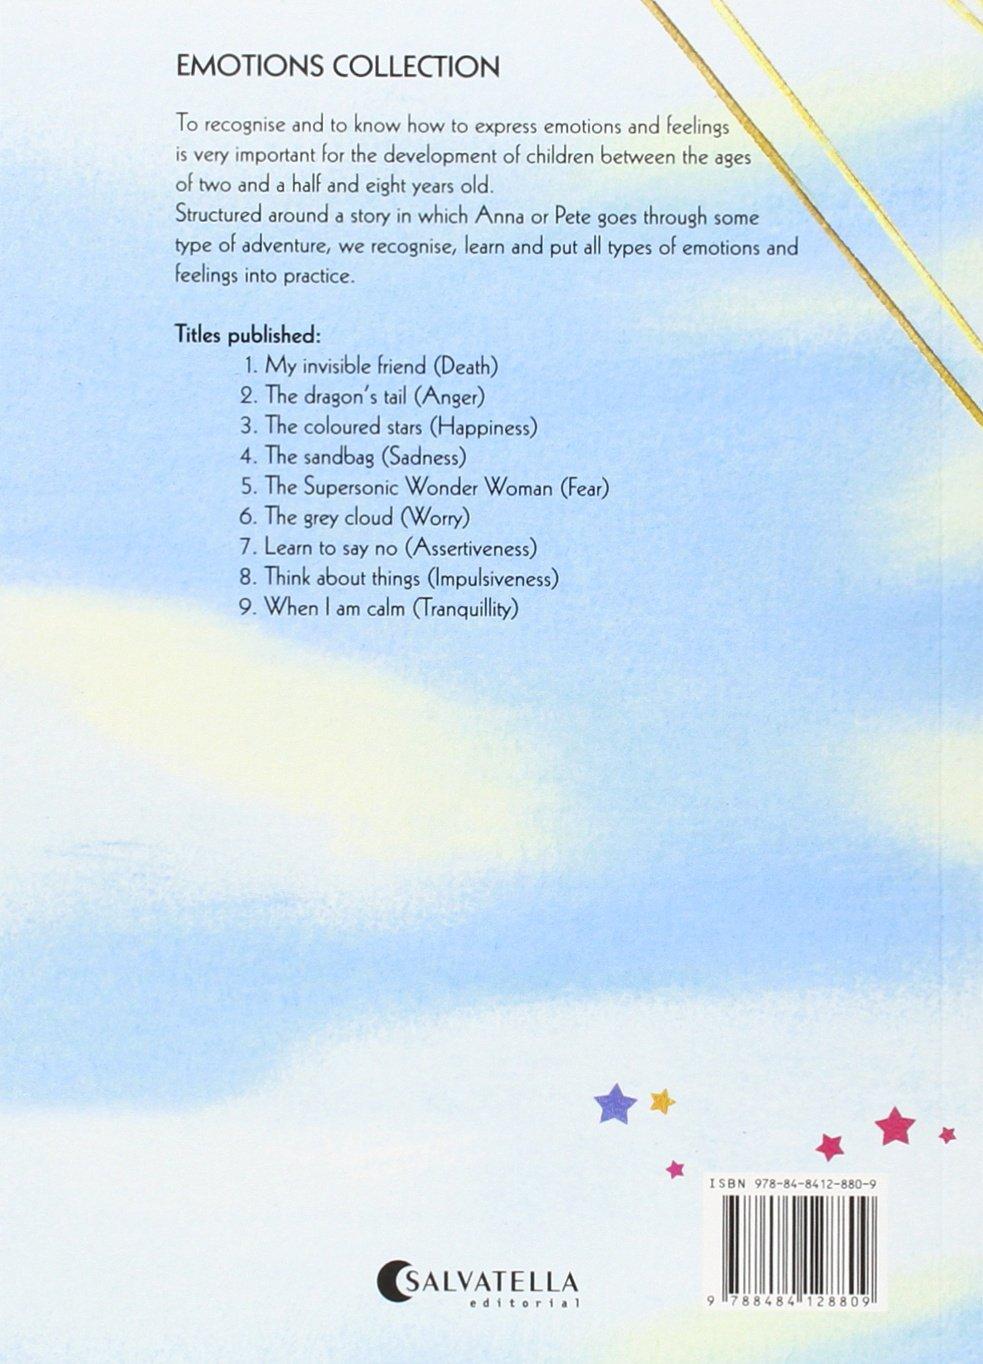 Emotions 3. The coloured stars: Mireia Canals Botines: 9788484128809: Amazon.com: Books